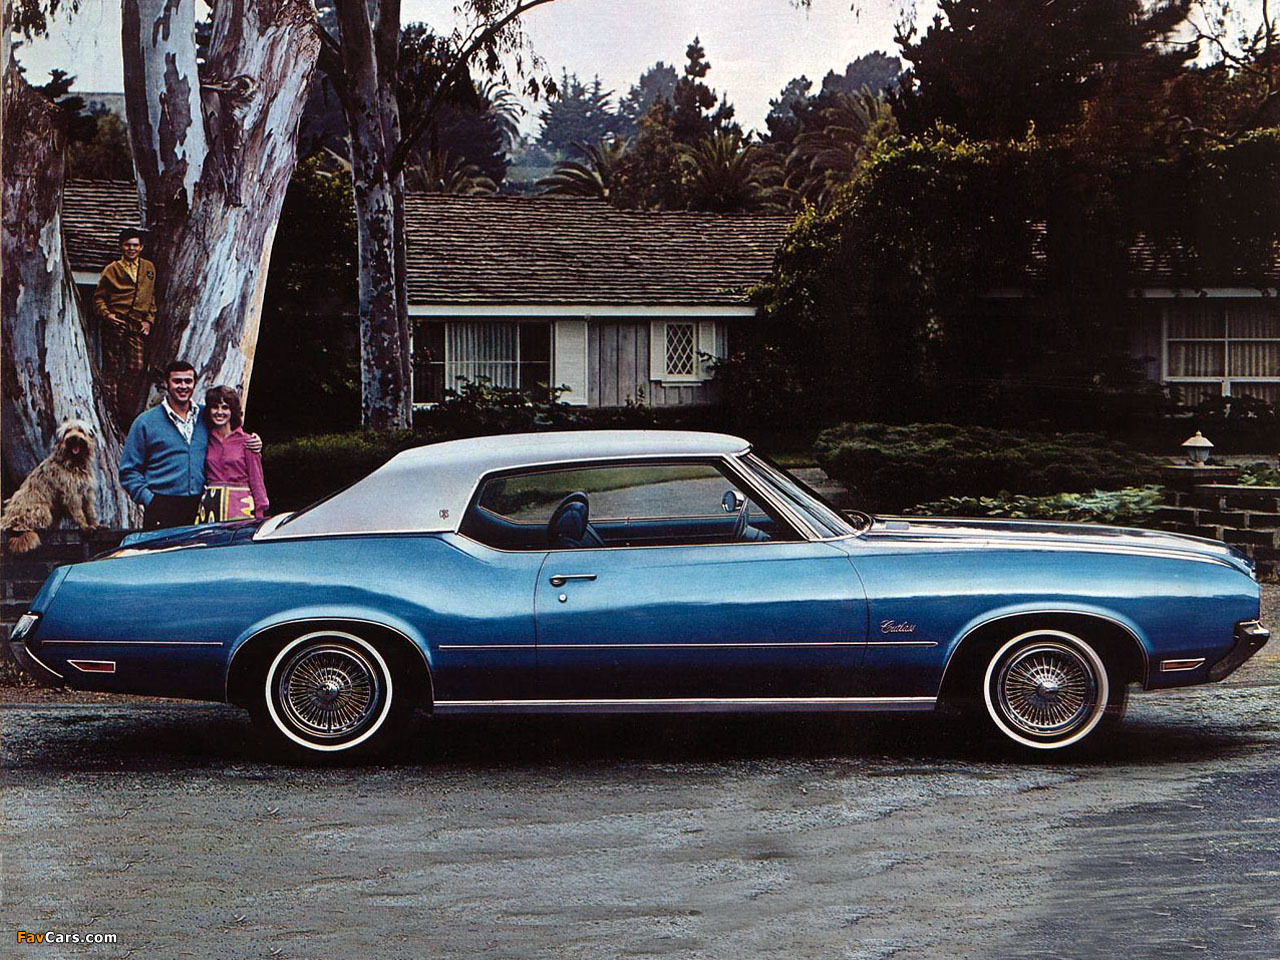 Oldsmobile Cutlass Supreme Holiday Coupe (CSU-J57) 1972 photos (1280 x 960)